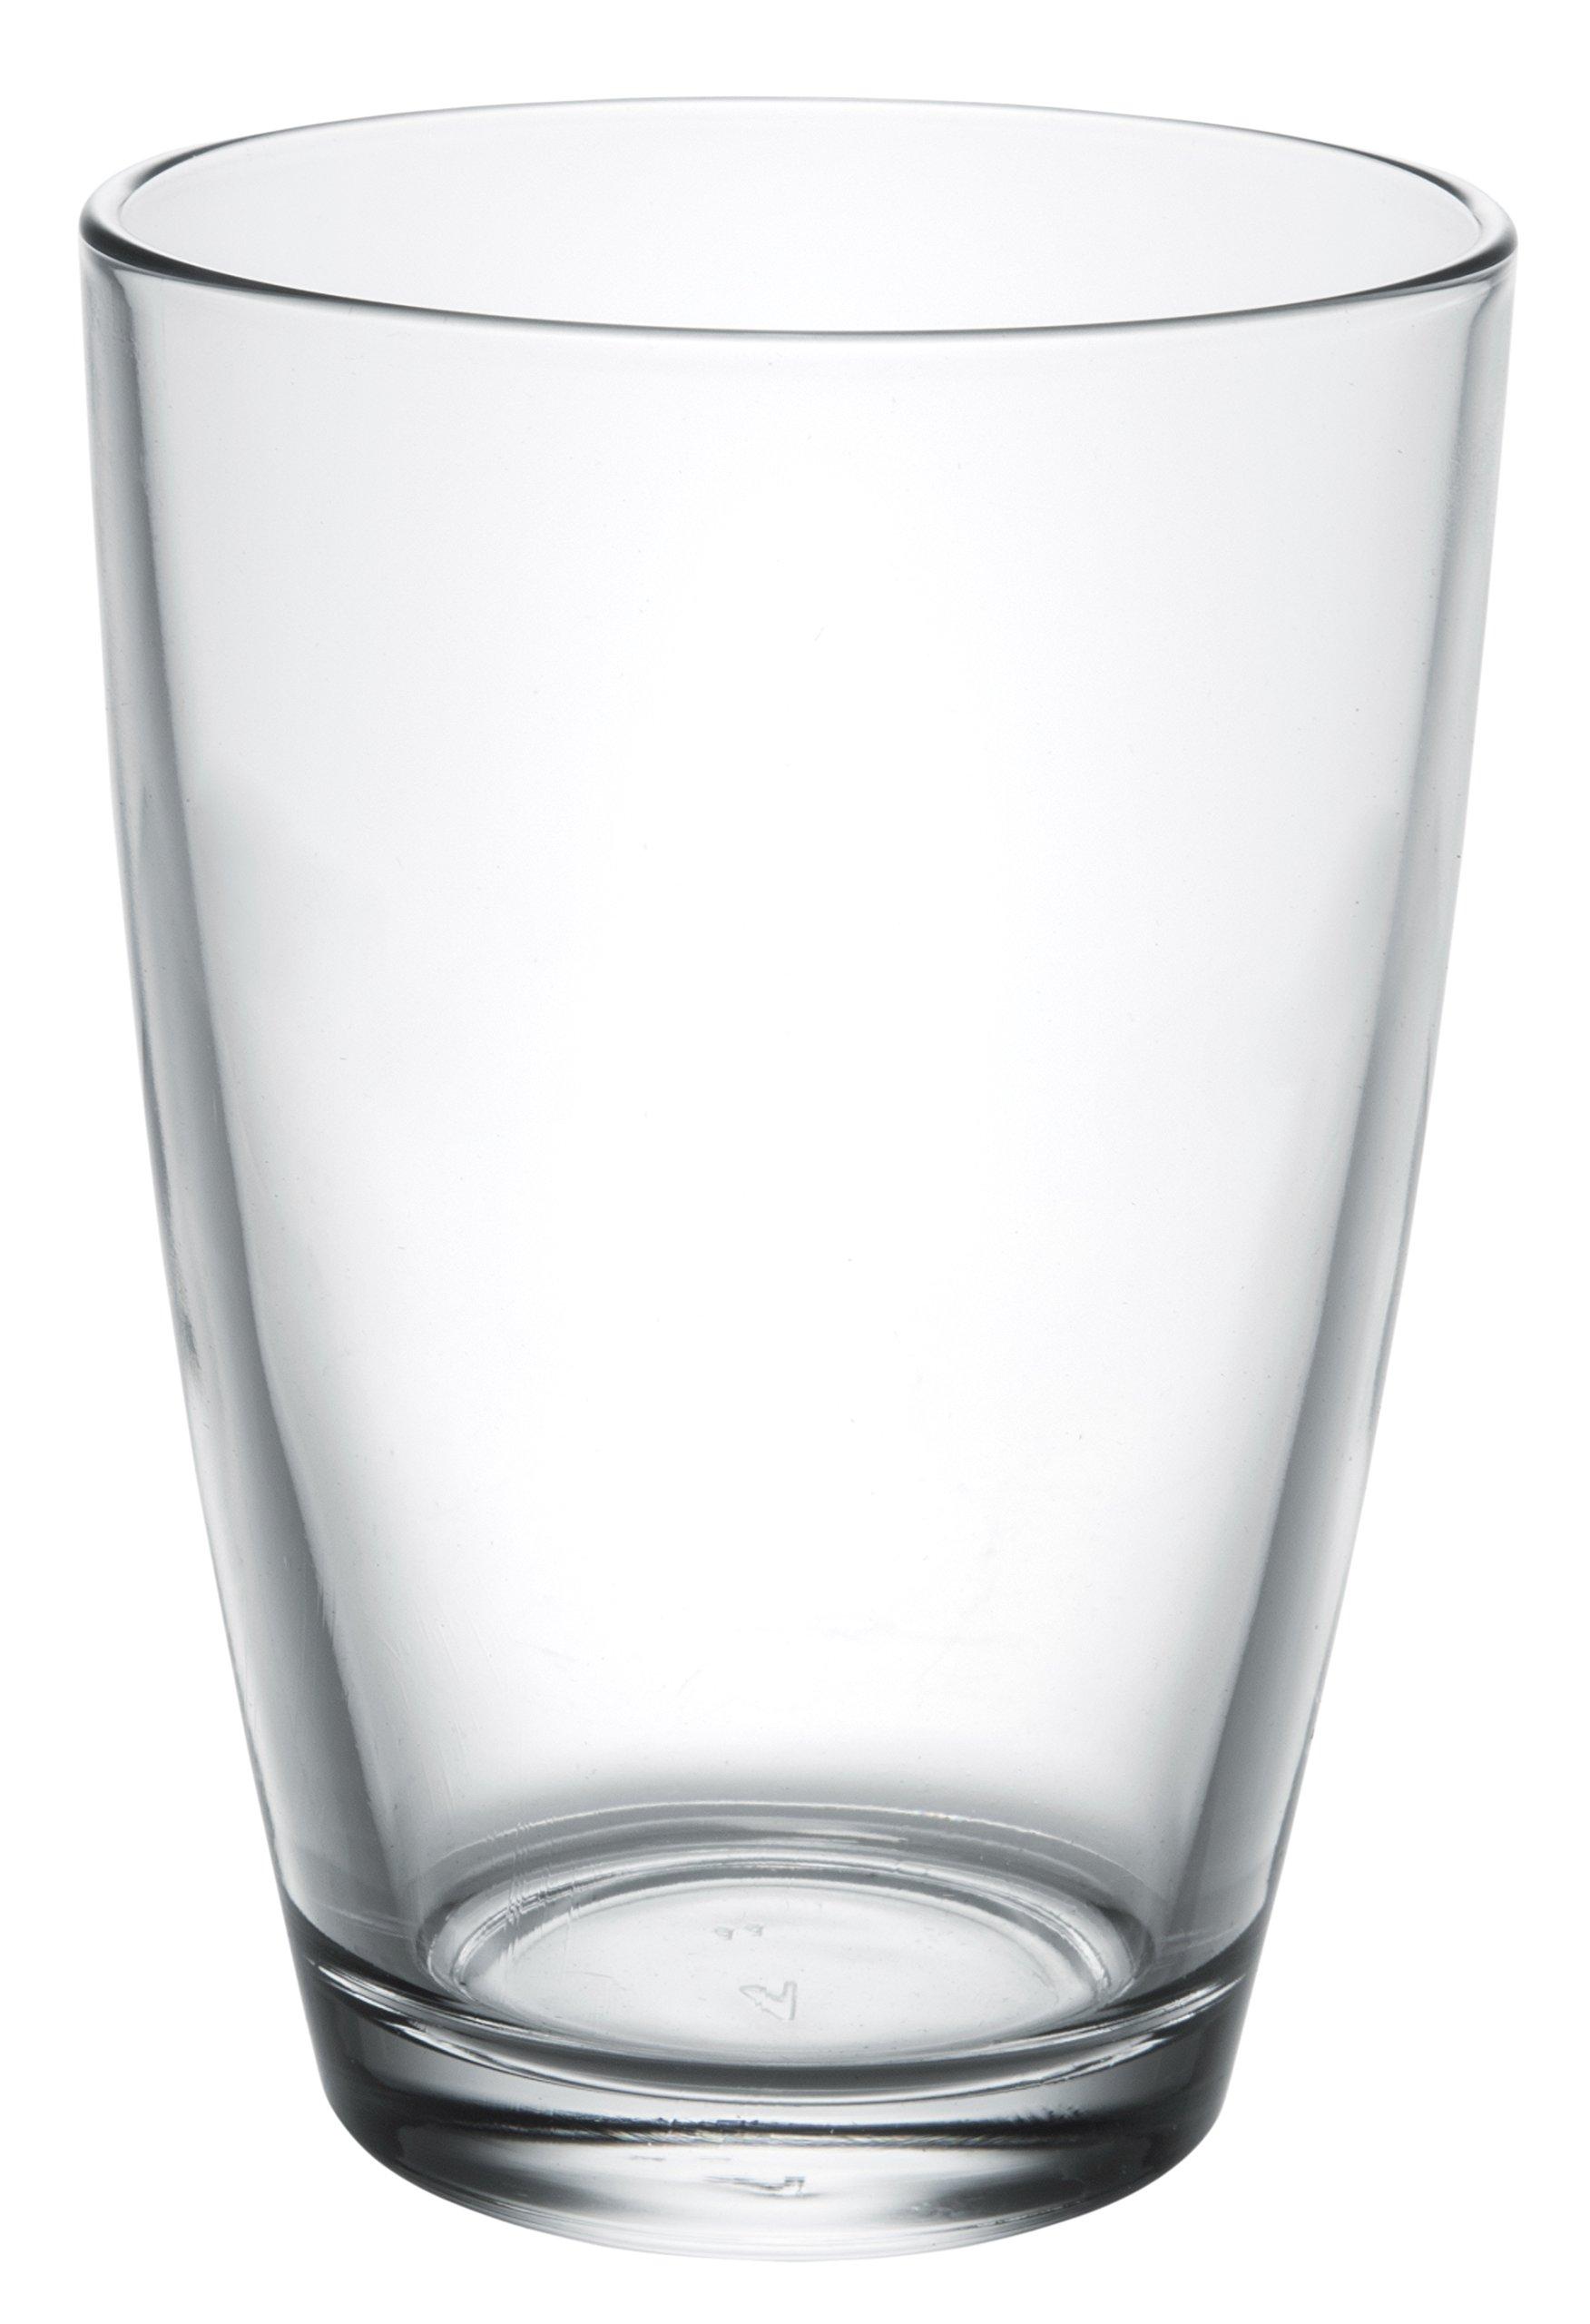 Vega Modern Clear Glass Tall Iced Tea Cups, Drinking Glasses Water Juice Soda Beverage Tumblers, Set of 6, 14 fl oz